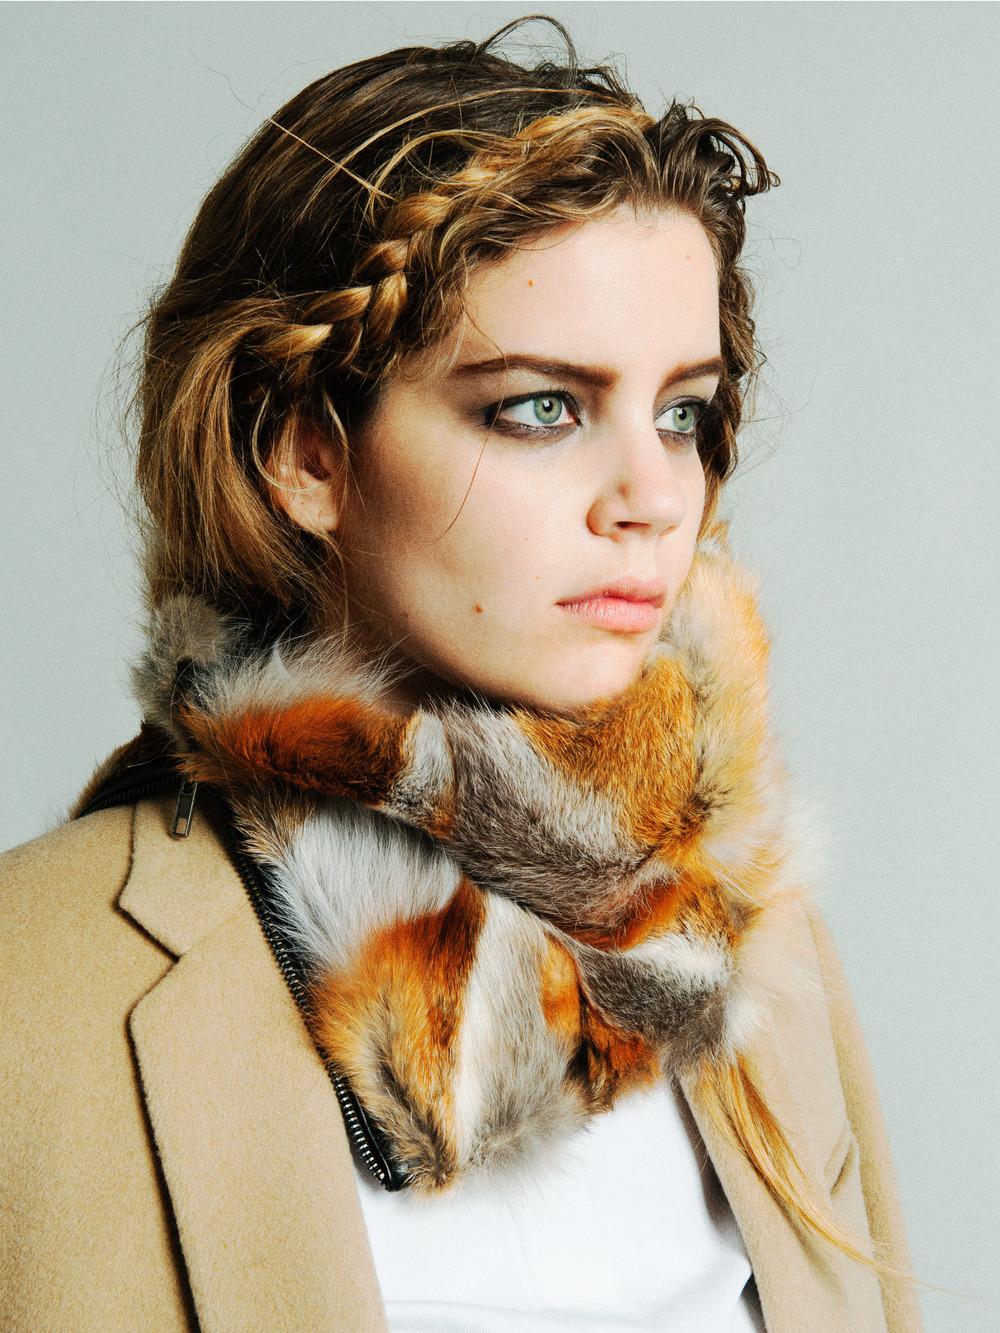 Fashion_by_LeandroJusten_005.jpg